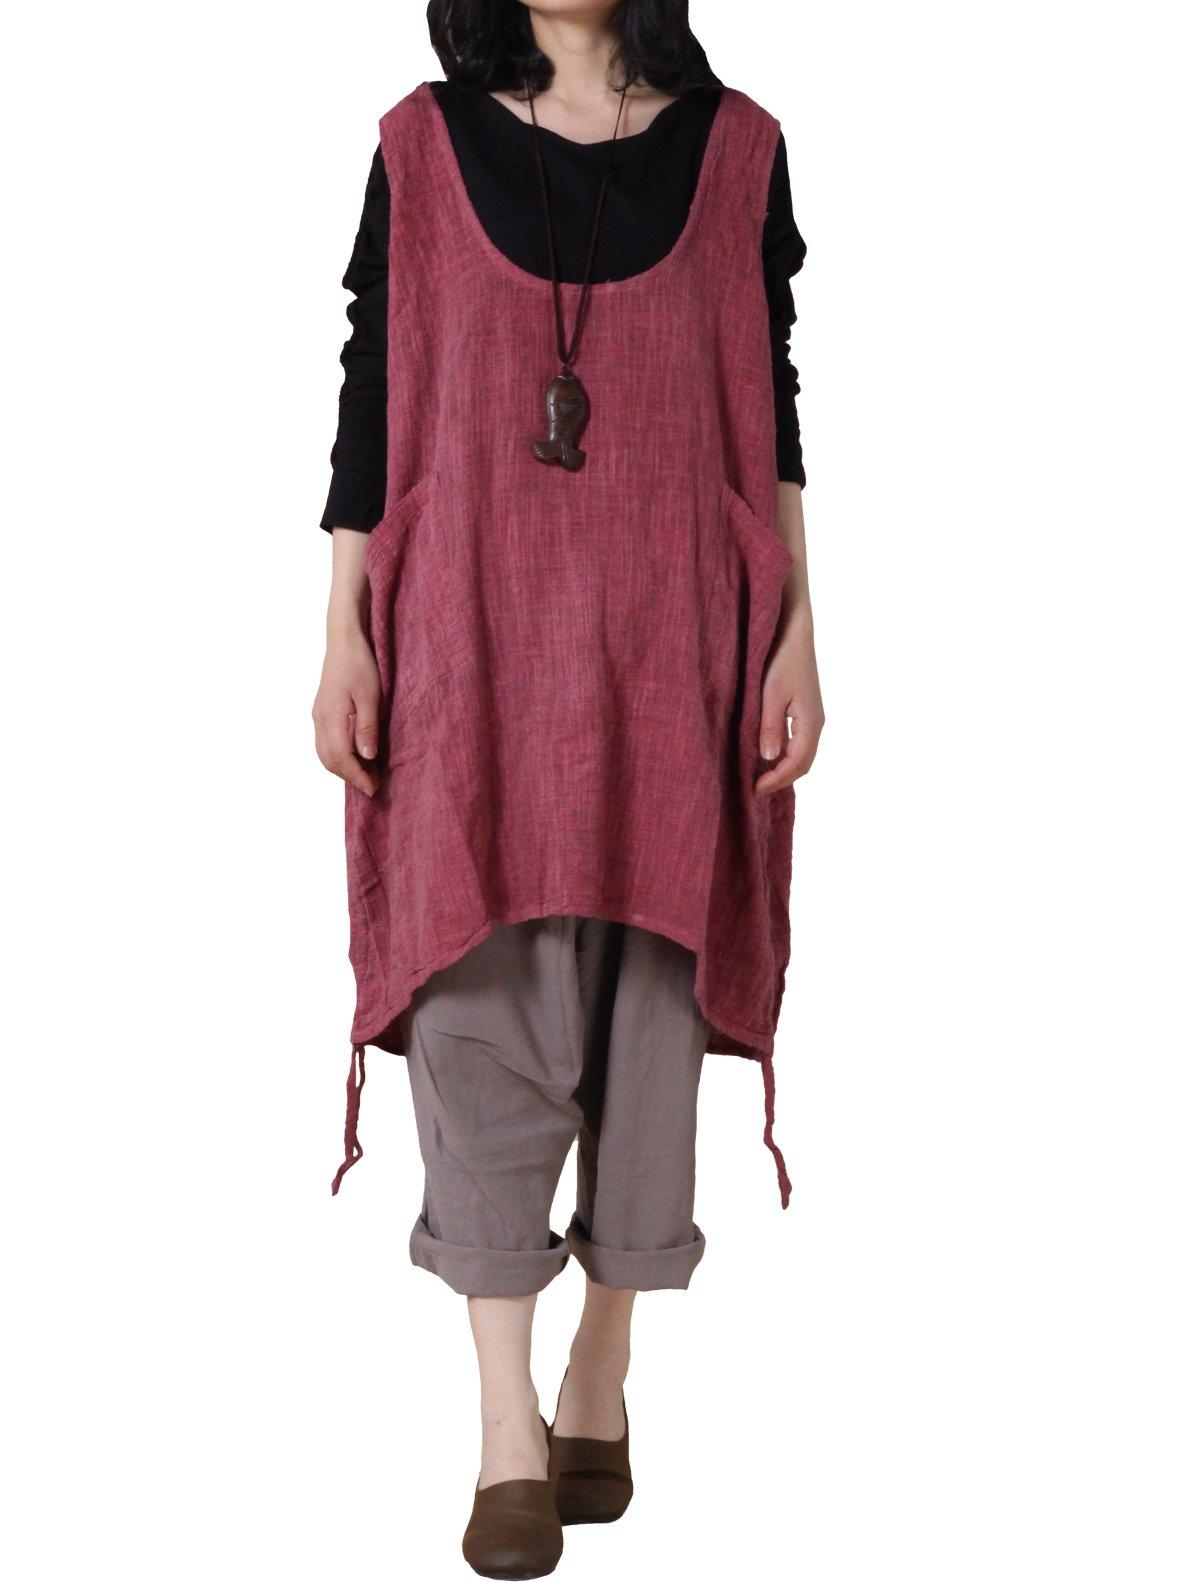 Mordenmiss Women's Summer Vest Dress Pull-up Hem Top L Dark Pink